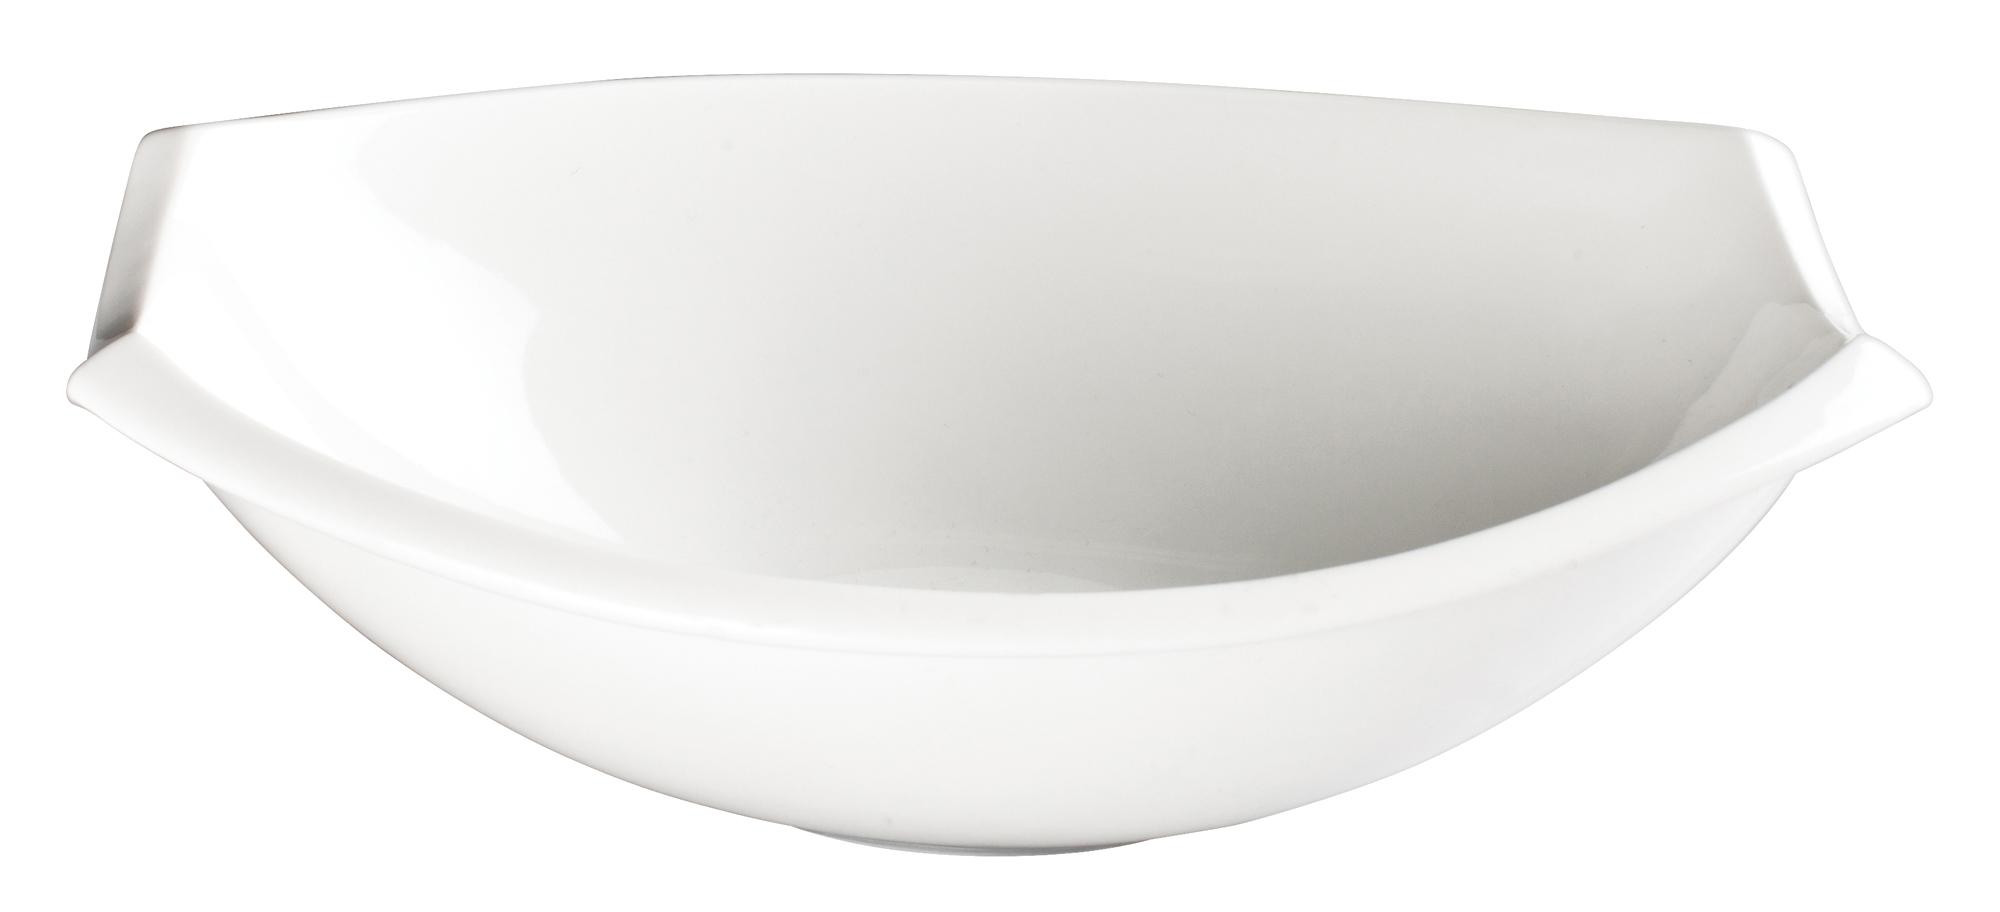 Winco WDP006-206 china, bowl, 17 - 32 oz